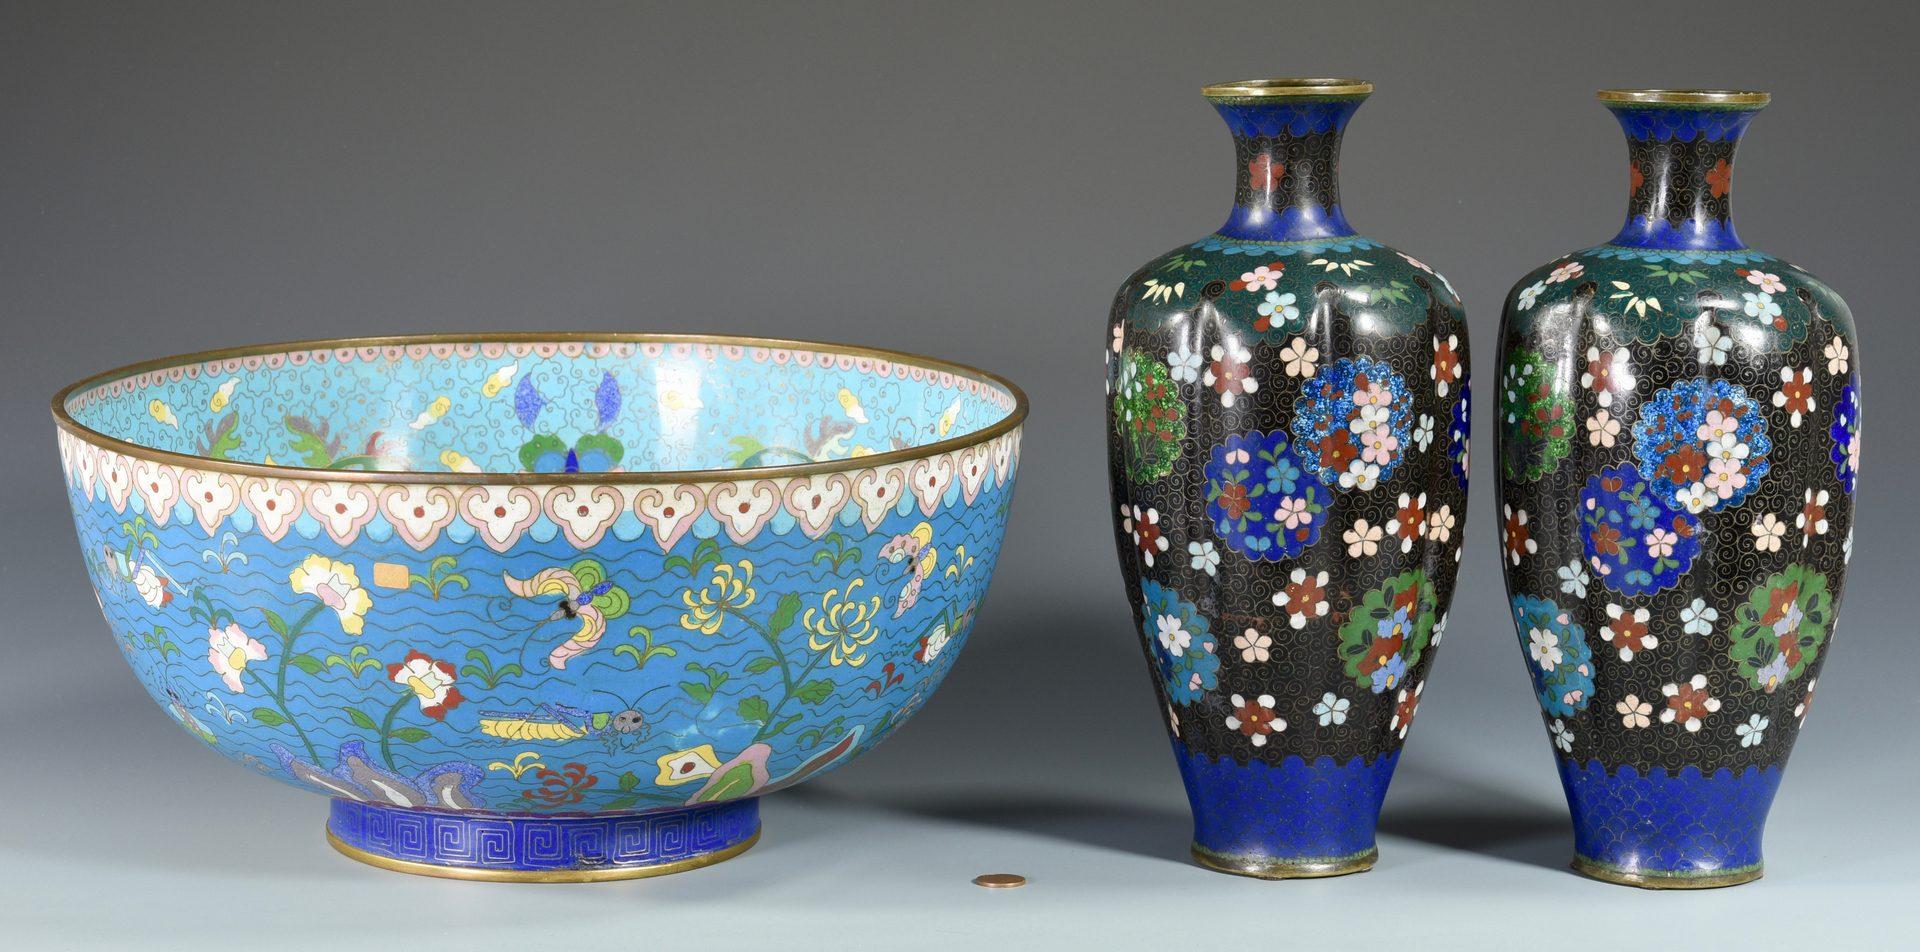 Lot 672: Pr. Asian Cloisonne Vases & Punchbowl